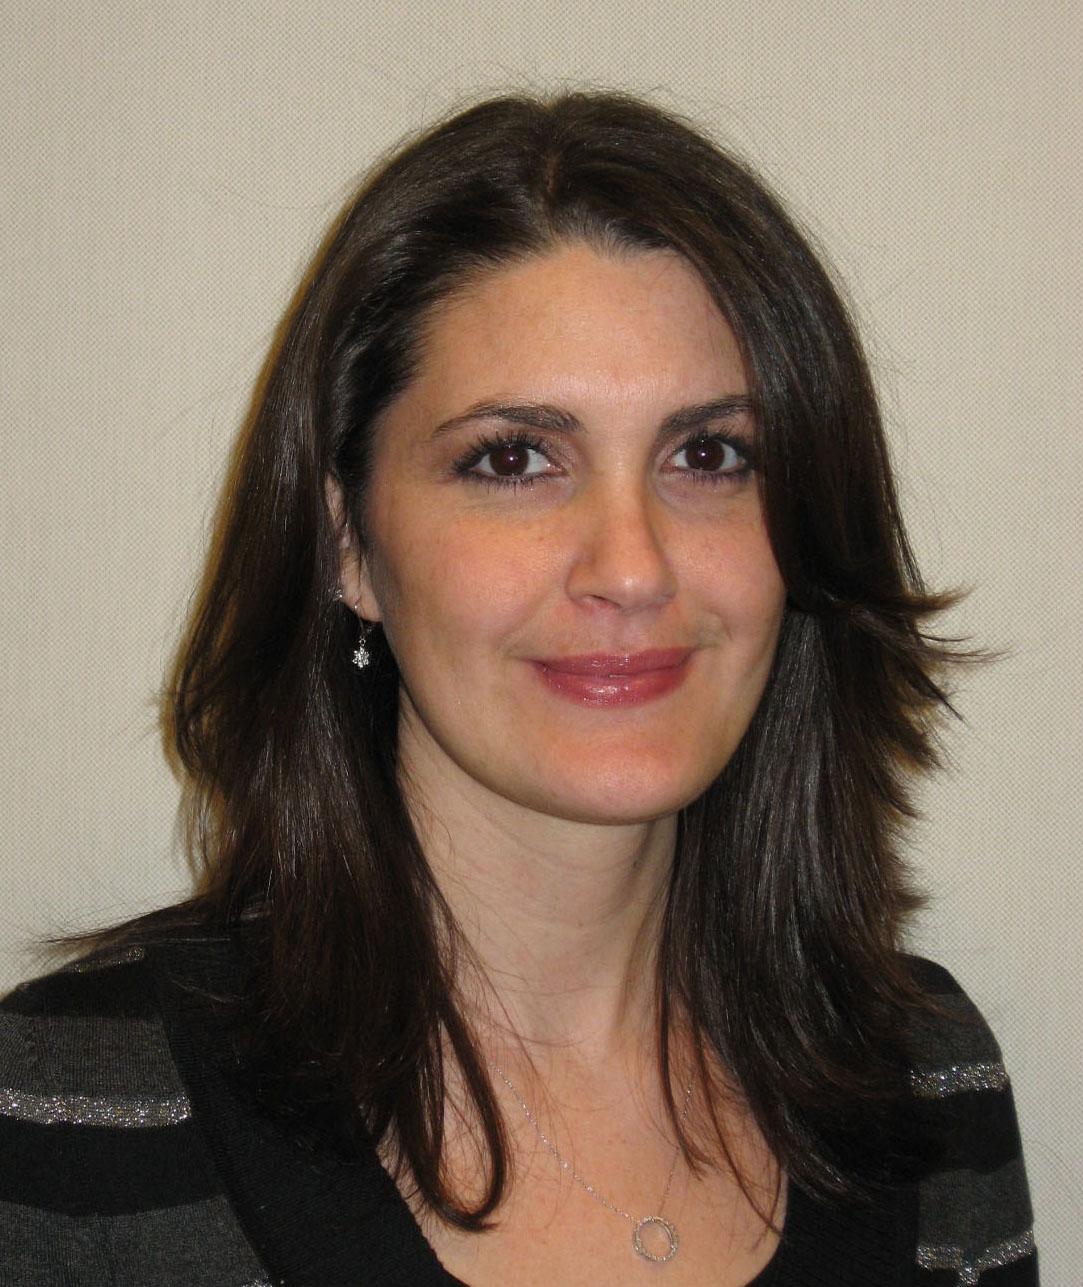 Jessica Fraga